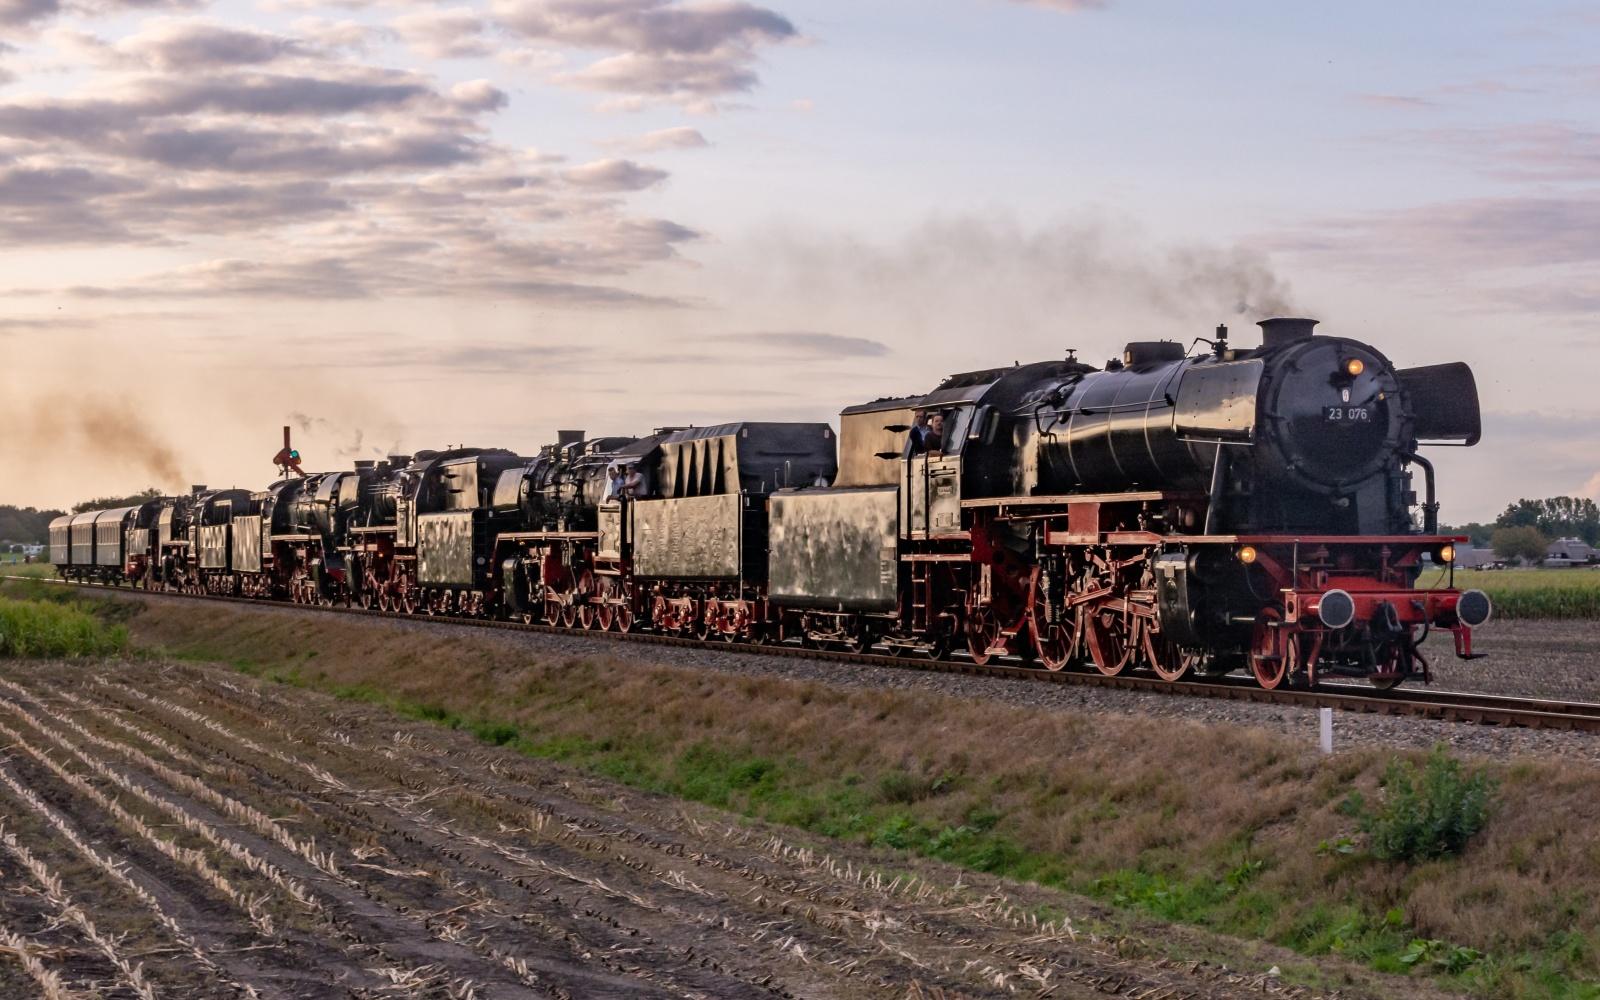 Eisenbahn Nostalgie Erlebnis Holland Dampfloks VSM Apeldoorn